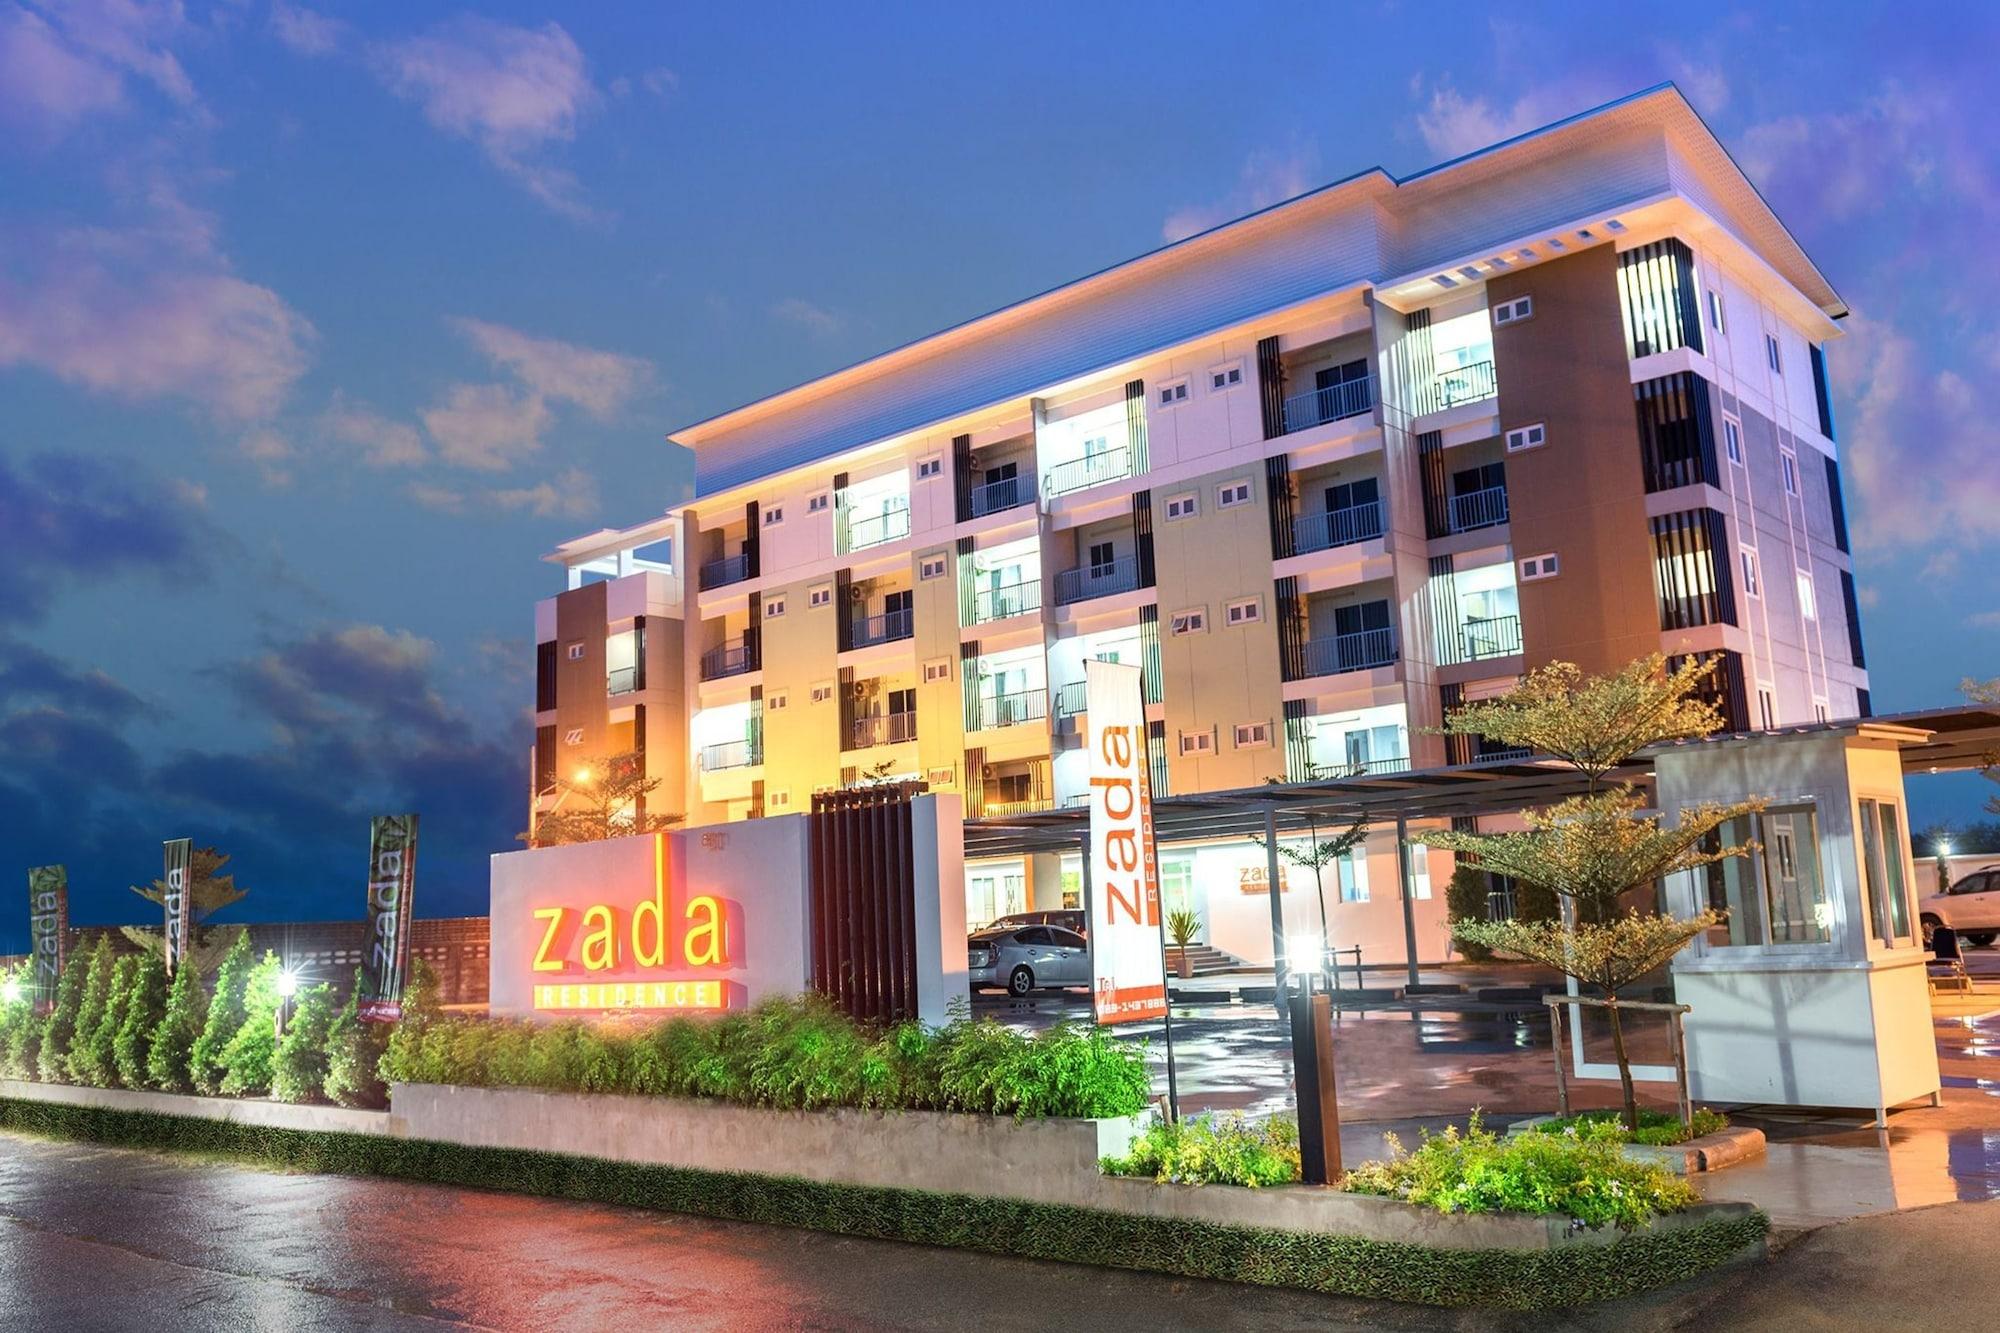 Zada Residence, Muang Nakhon Ratchasima